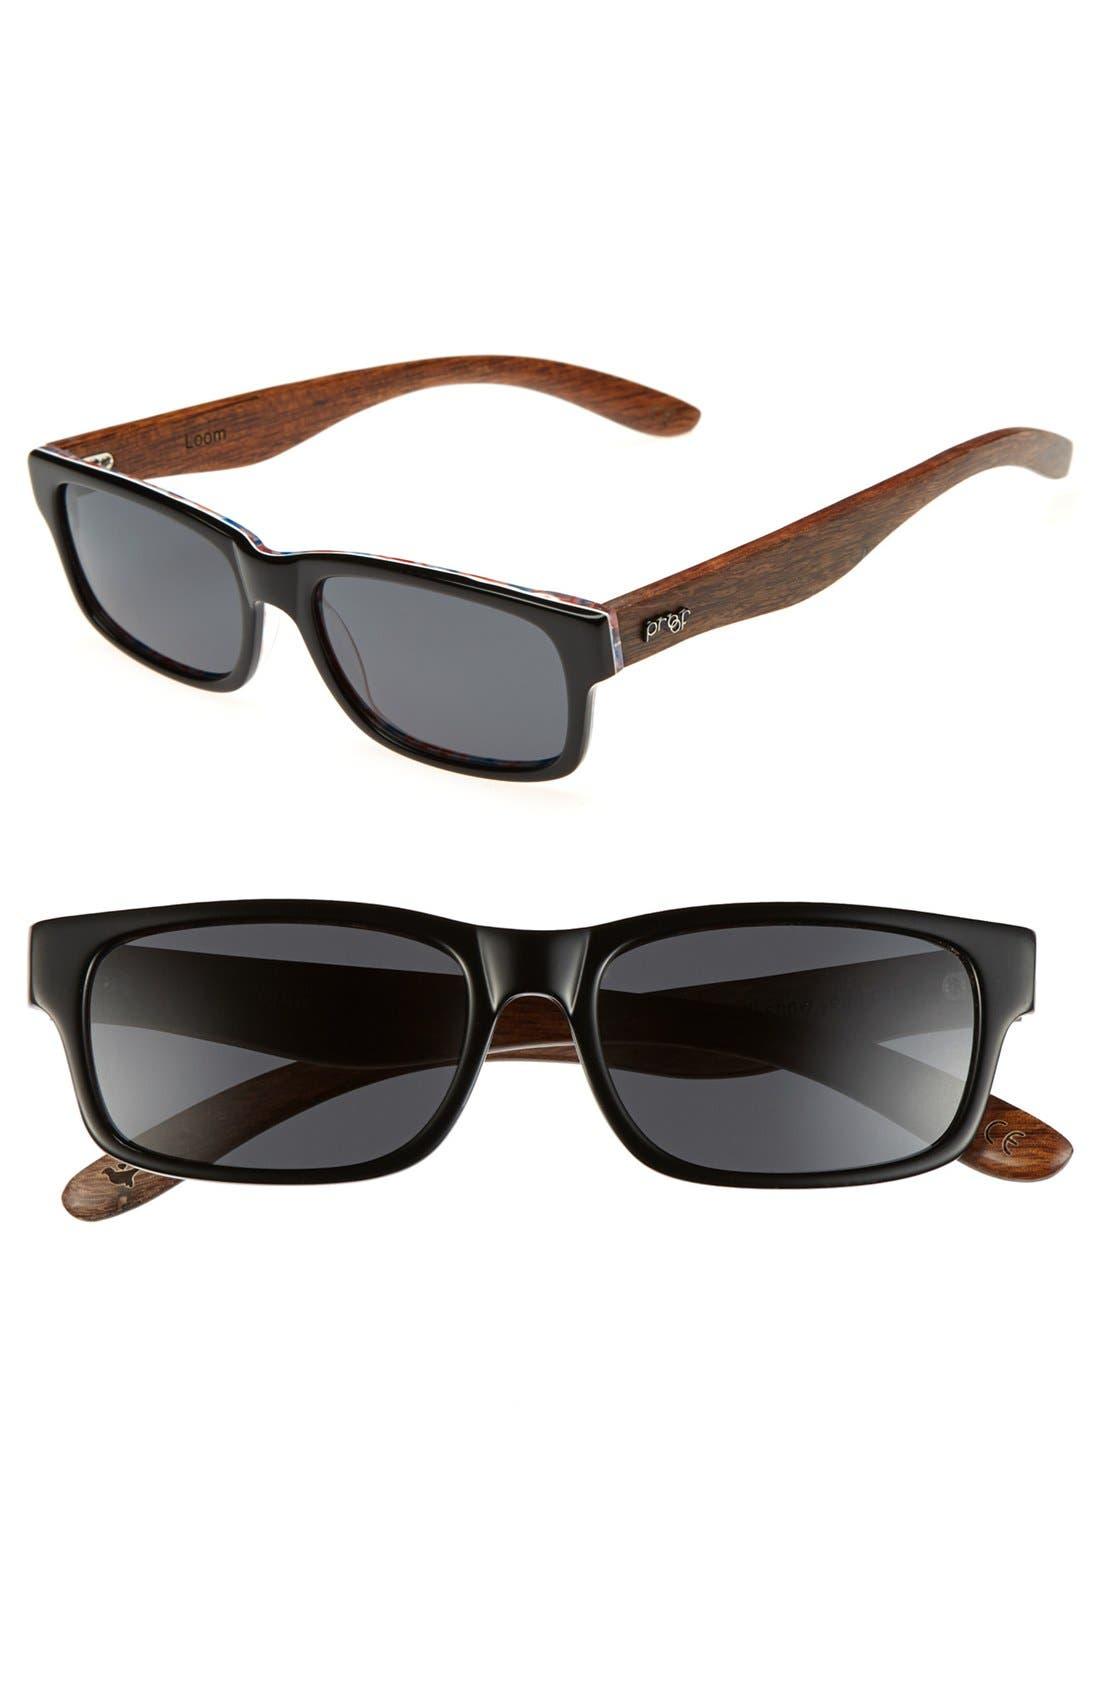 Alternate Image 1 Selected - Proof Eyewear 'Loom' 51mm Polarized Sunglasses